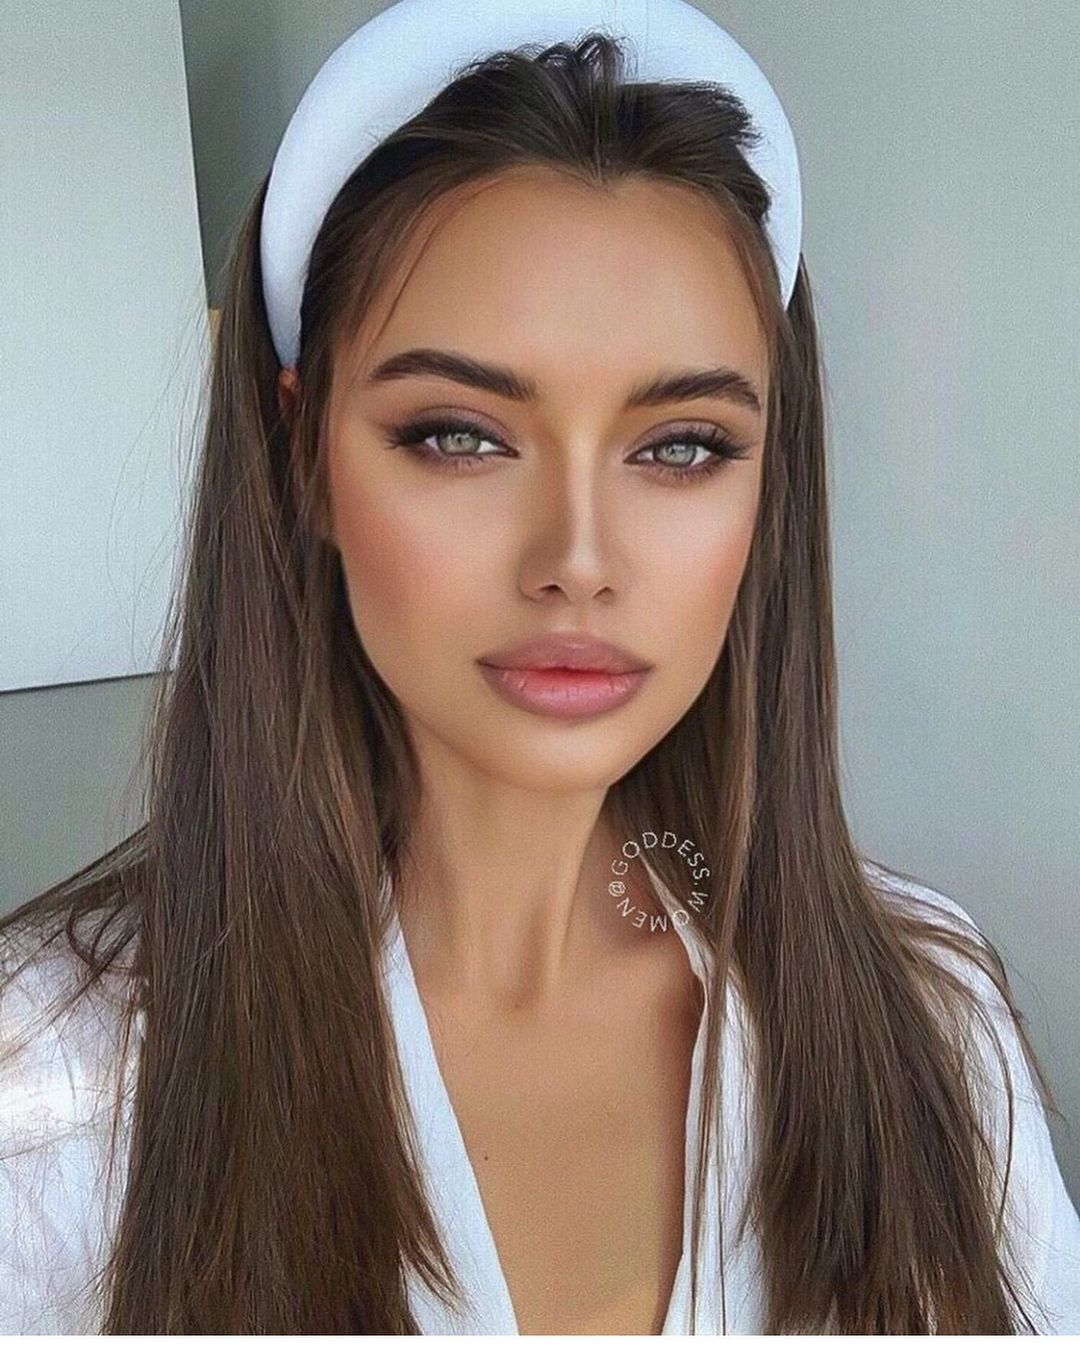 Ukraine Stylish Girl DP